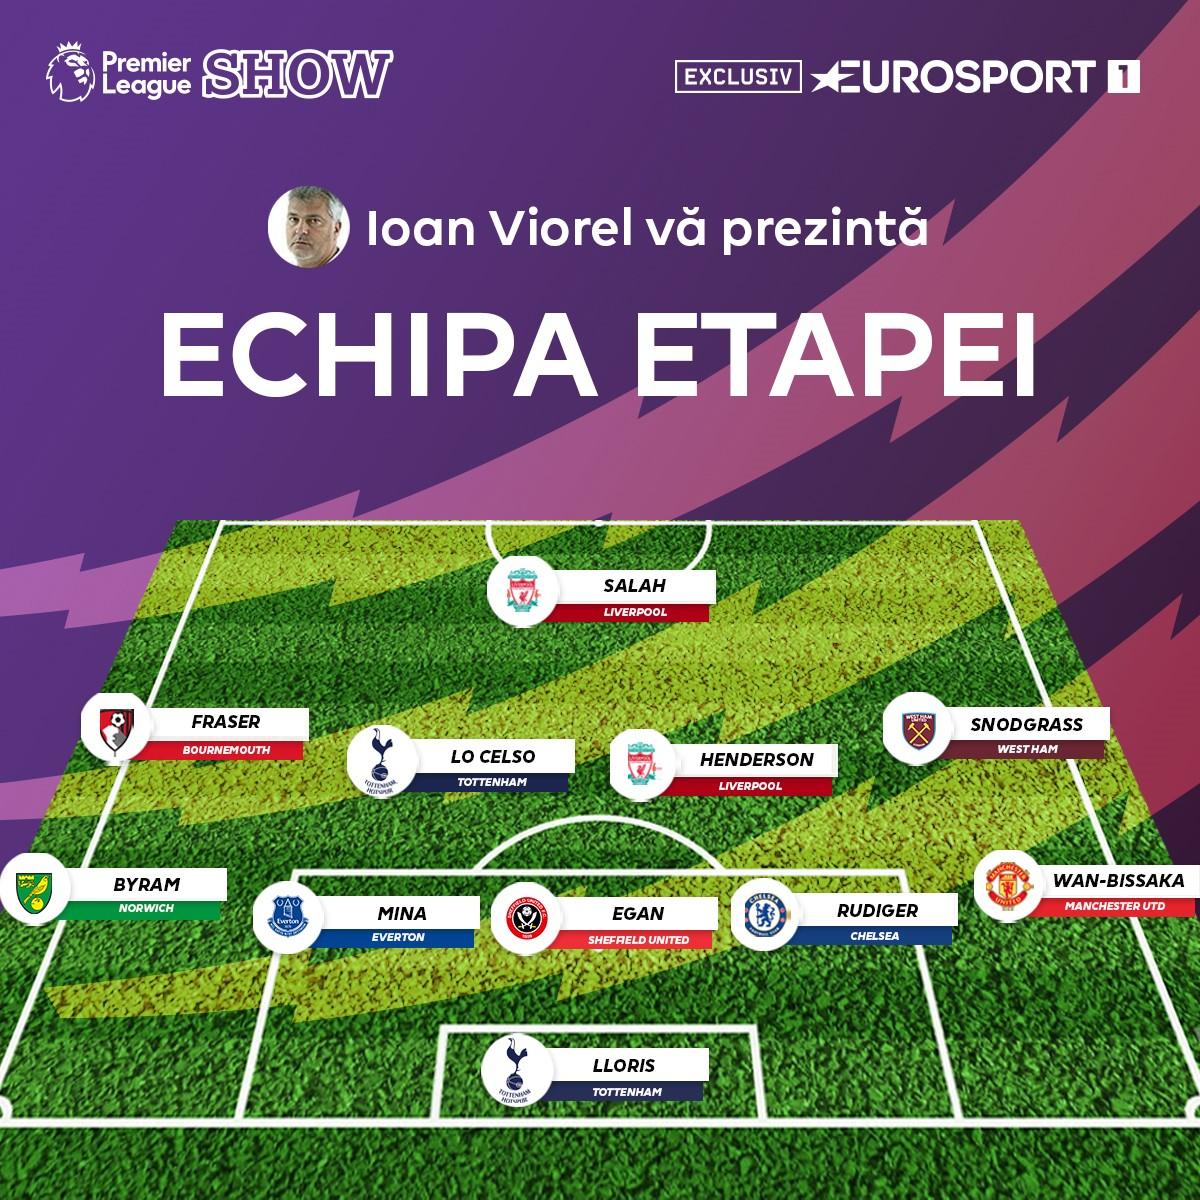 https://i.eurosport.com/2020/02/05/2769607.jpg